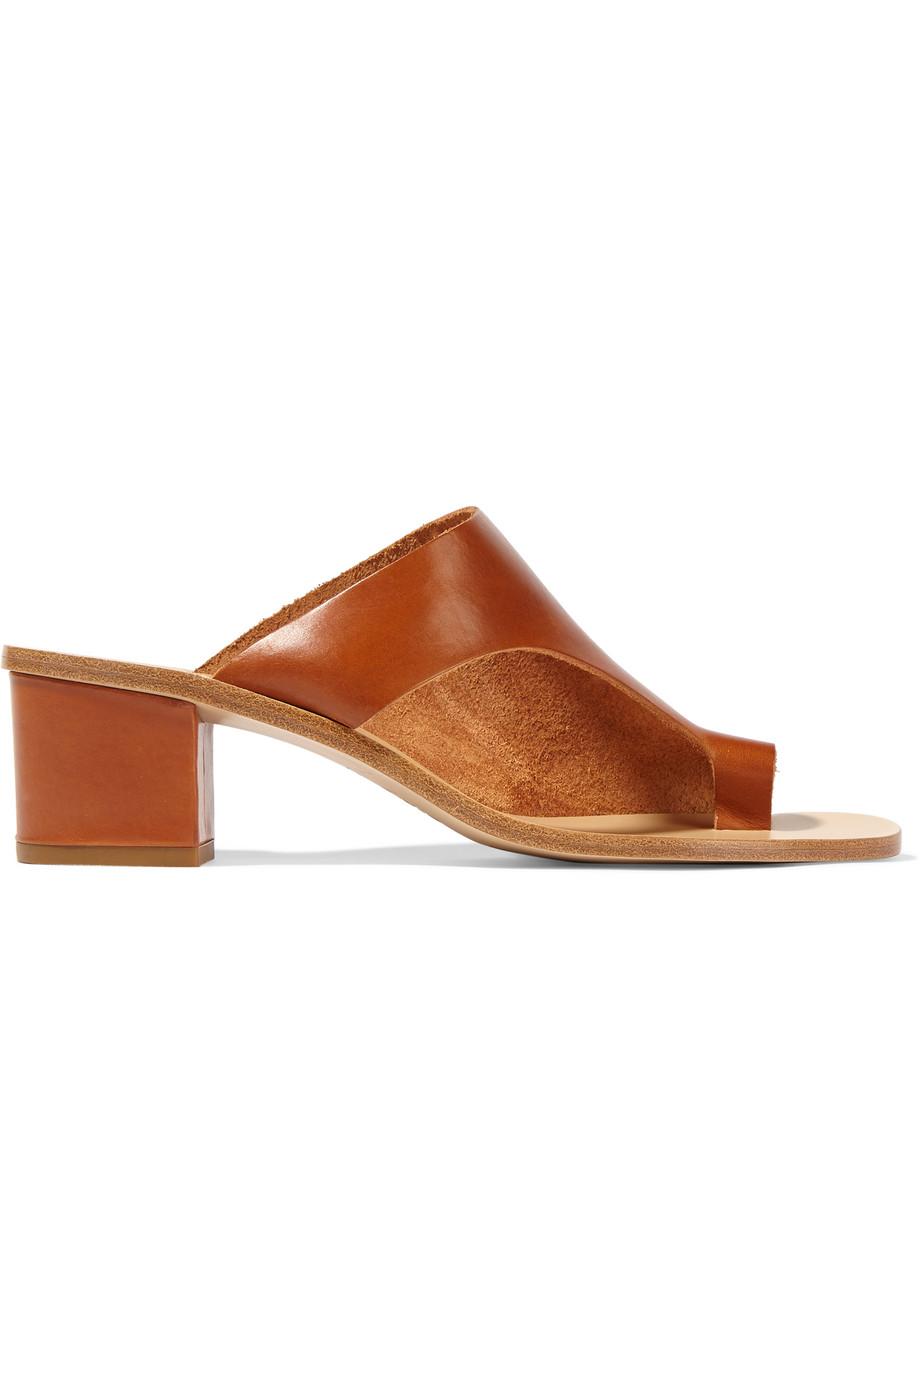 ATP Atelier Cyla Cutout Leather Sandals, Tan, Women's US Size: 9.5, Size: 40